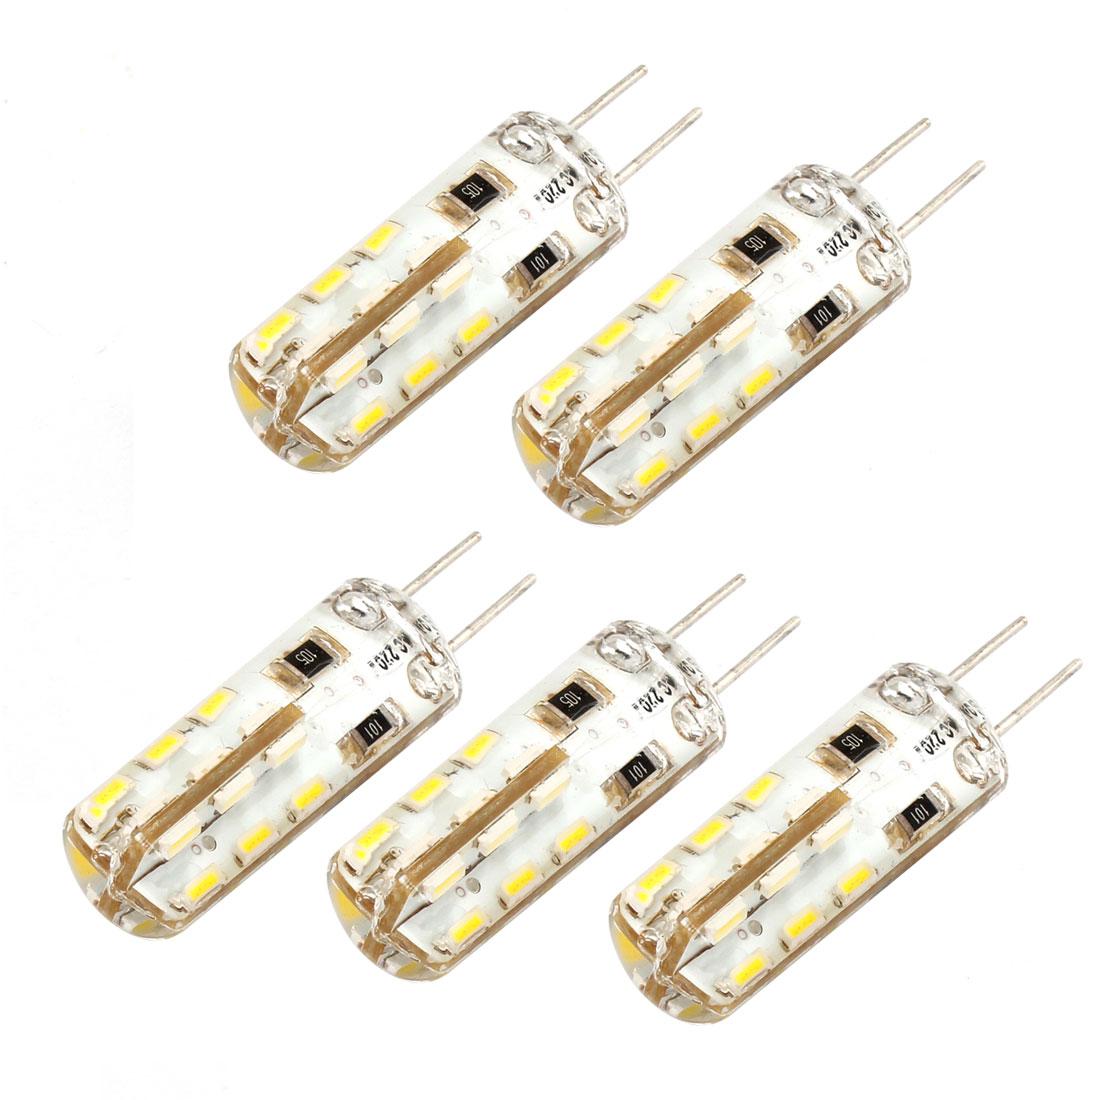 G4 2W 100-120LM 24 3014 SMD LED Light Lamp Bulb AC220V White 5 Pcs